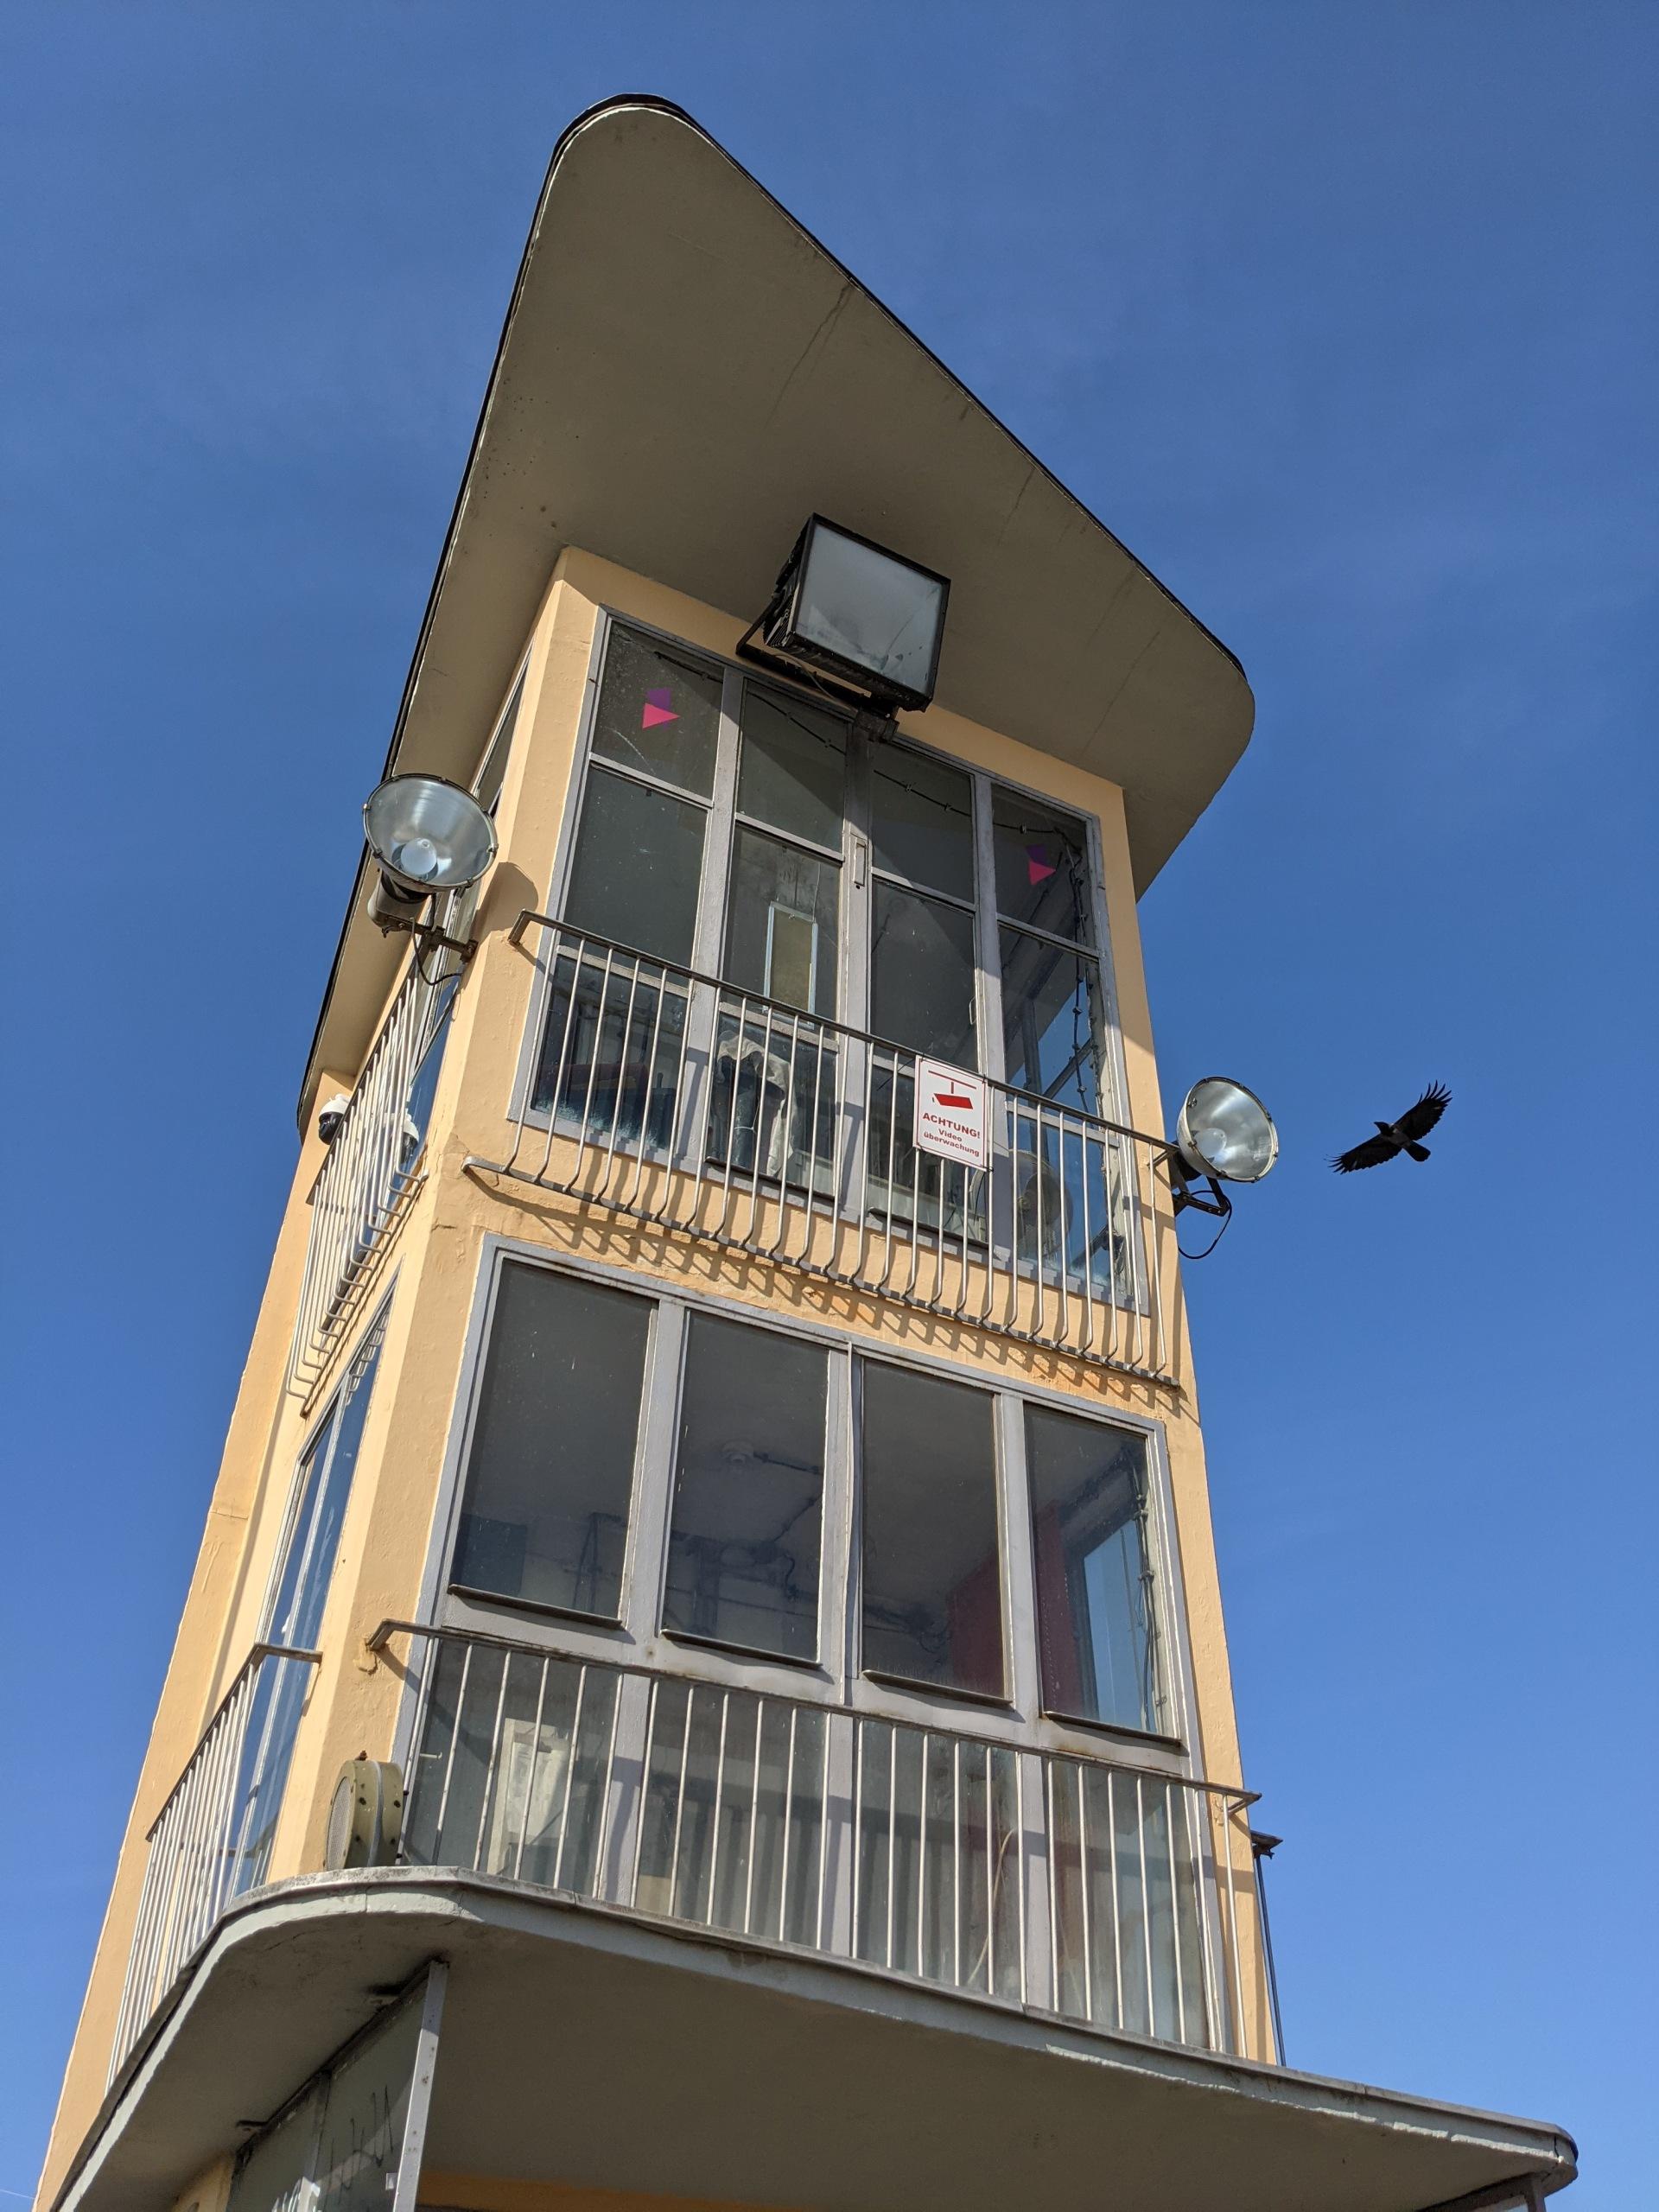 Zielrichterturm-1.jpg